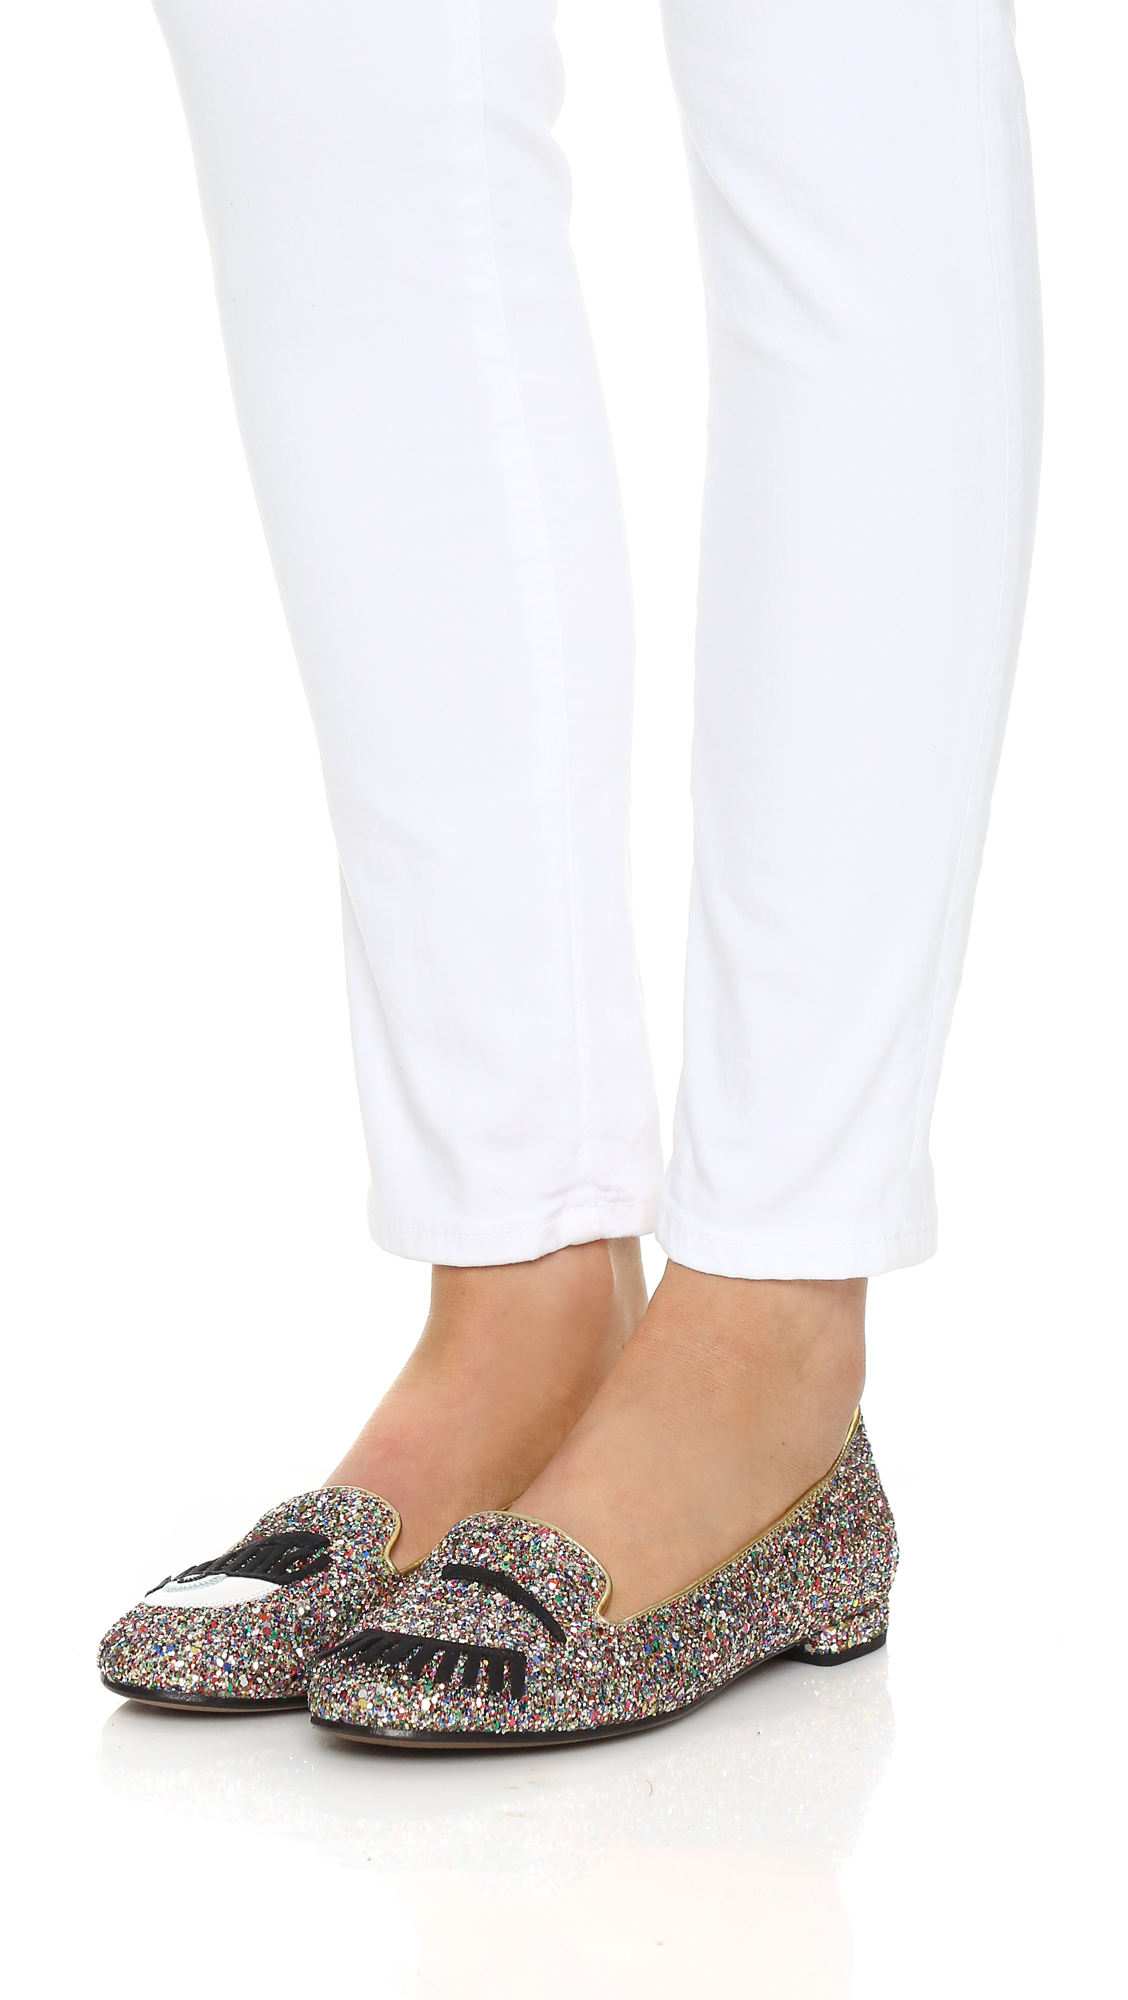 Chiara Ferragni Flirting slippers 0EWdZb3